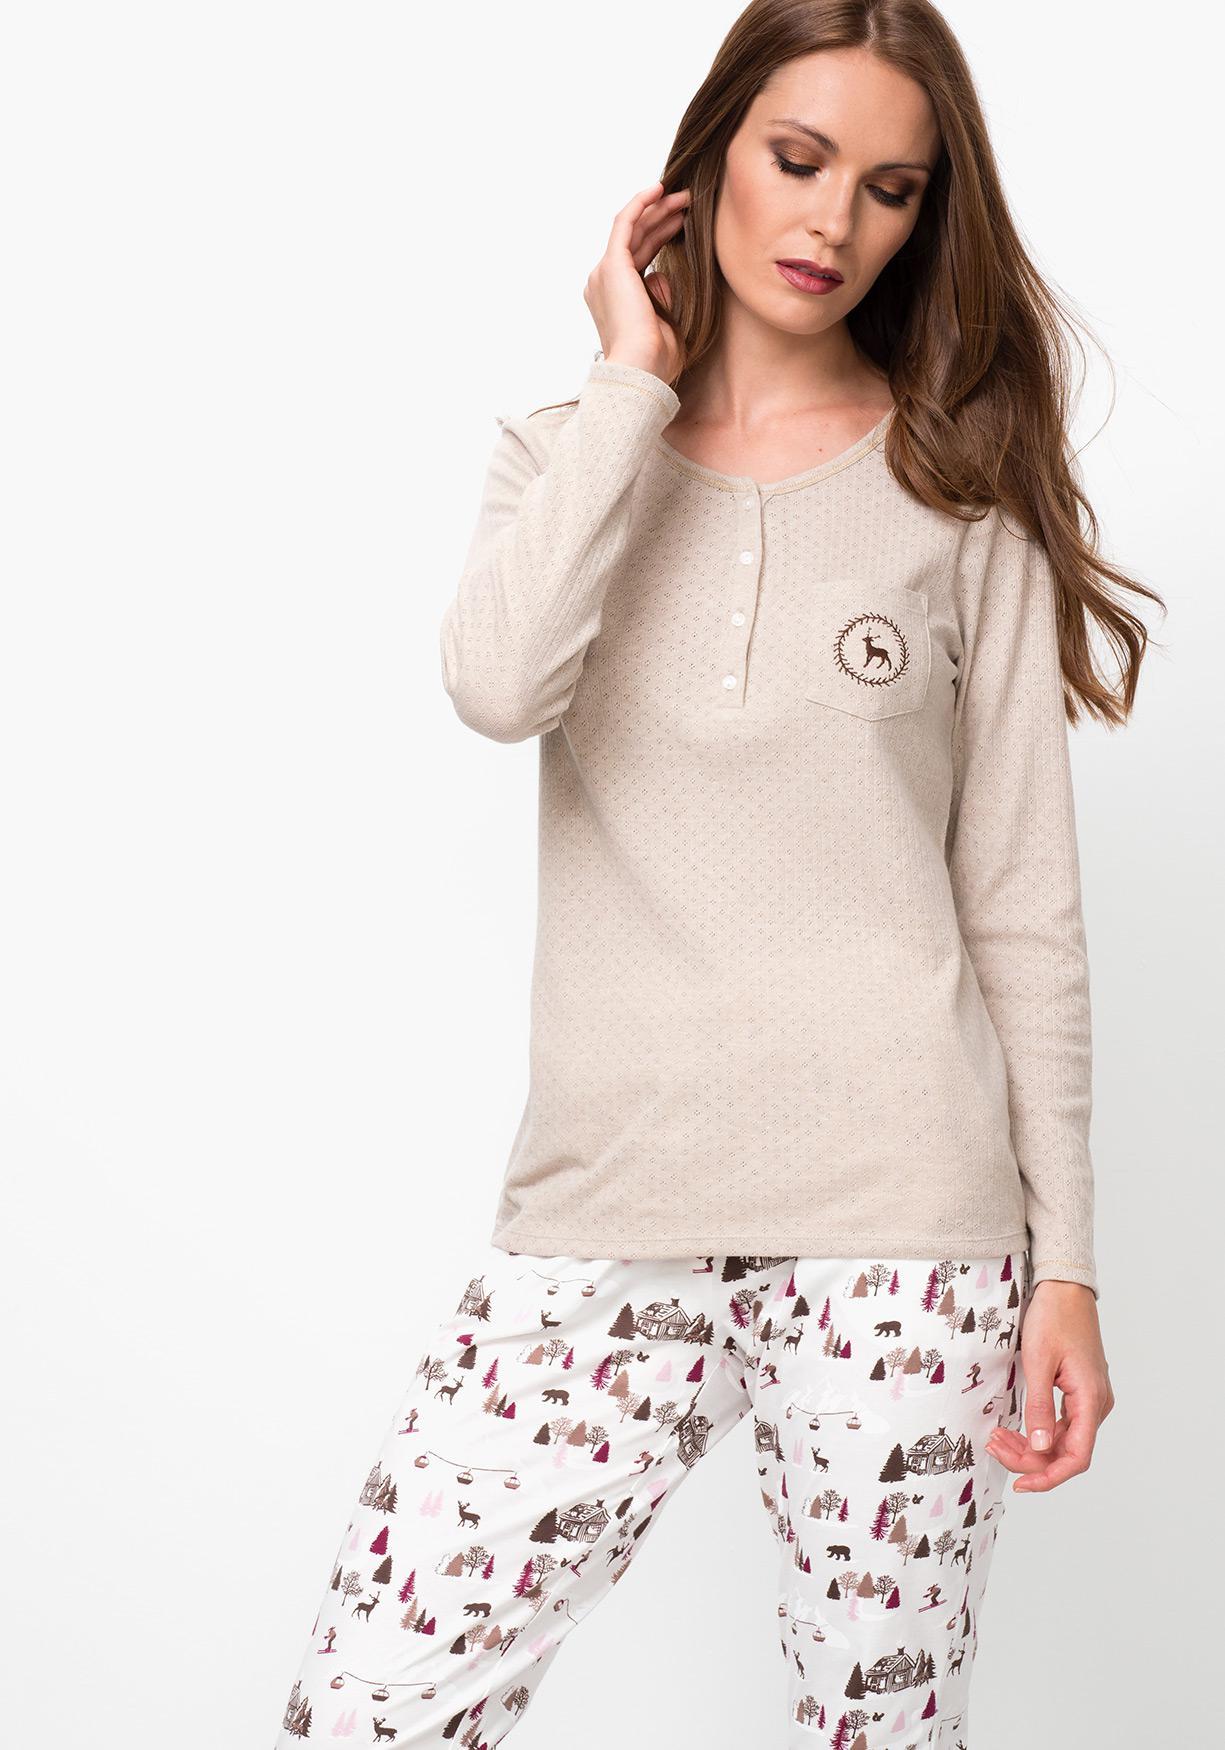 Comprar Camiseta lencería de mujer manga larga TEX. ¡Aprovéchate de ... 98ffbebe7ab0